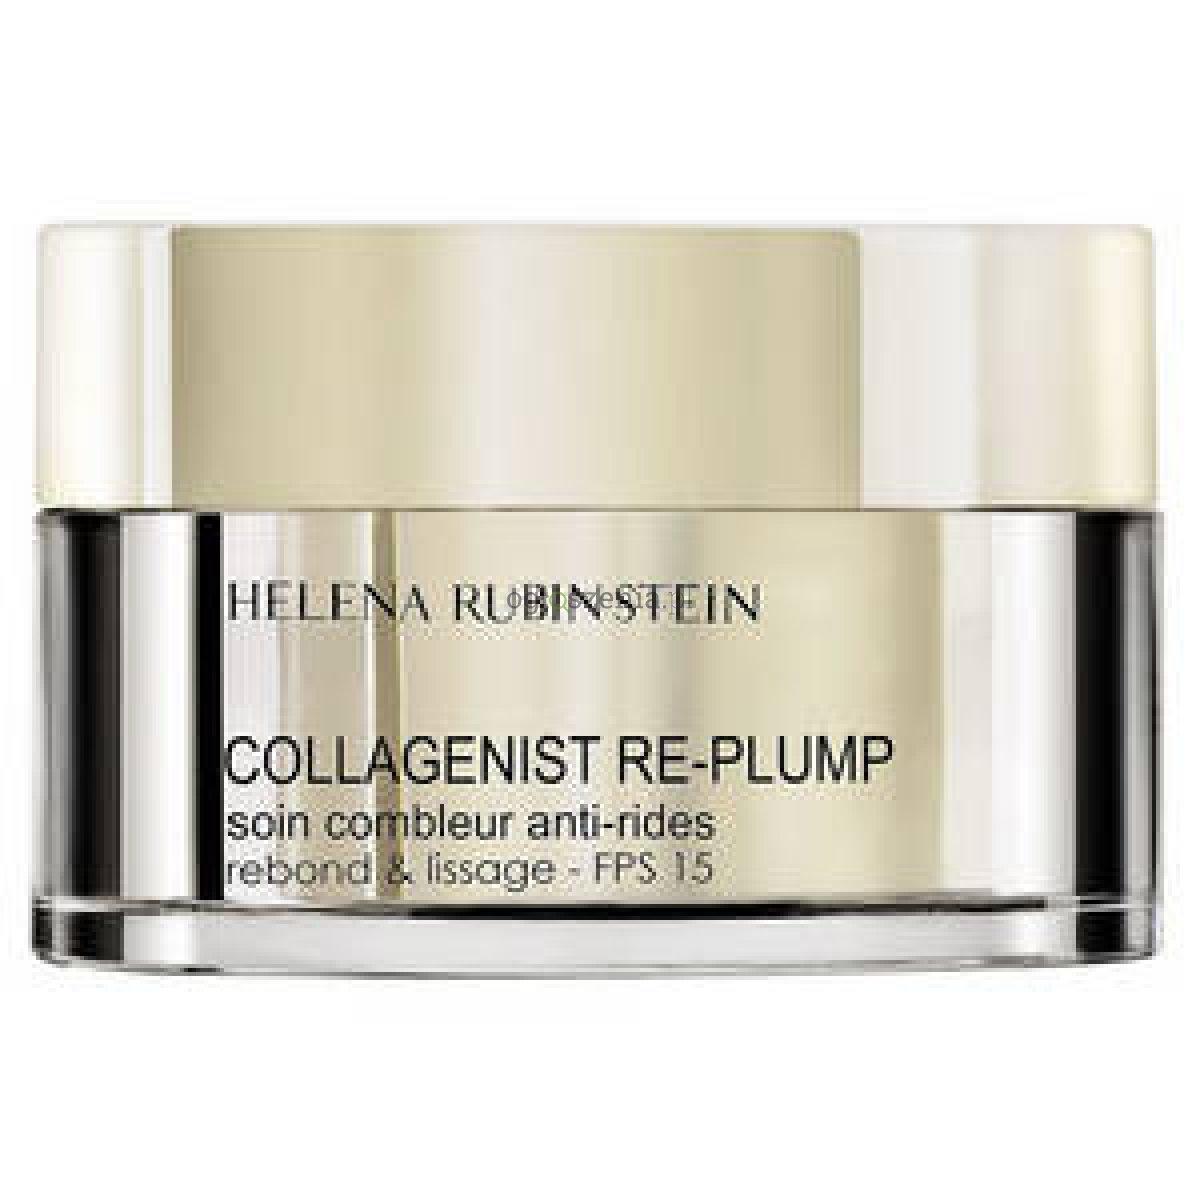 HELENA RUBINSTEIN Collagenist Re-Plump Night 50 ml